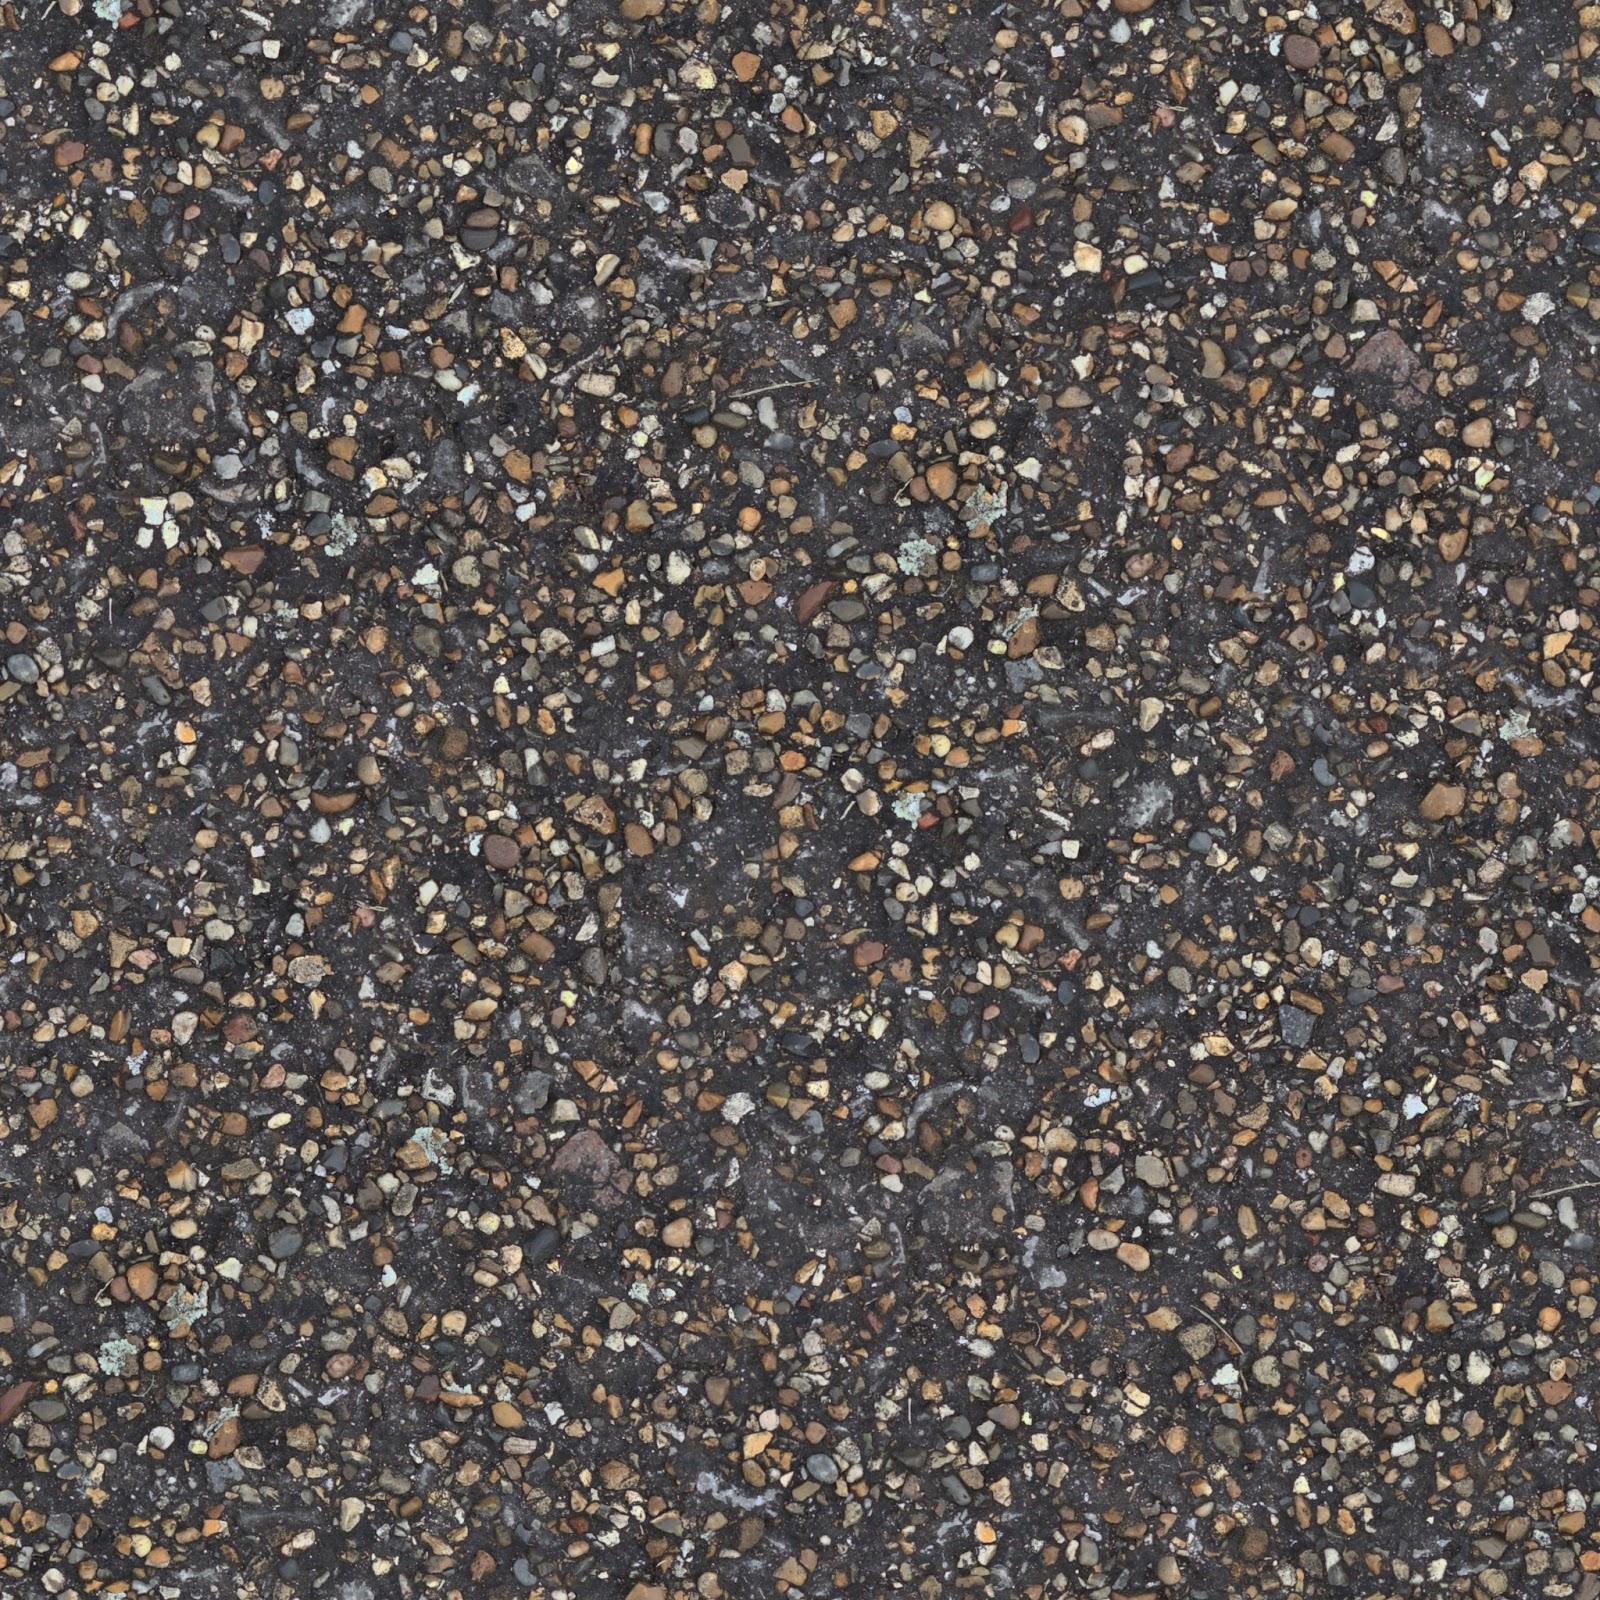 Concrete pebble stone walkway pathway seamless texture ver 1 2048x2048